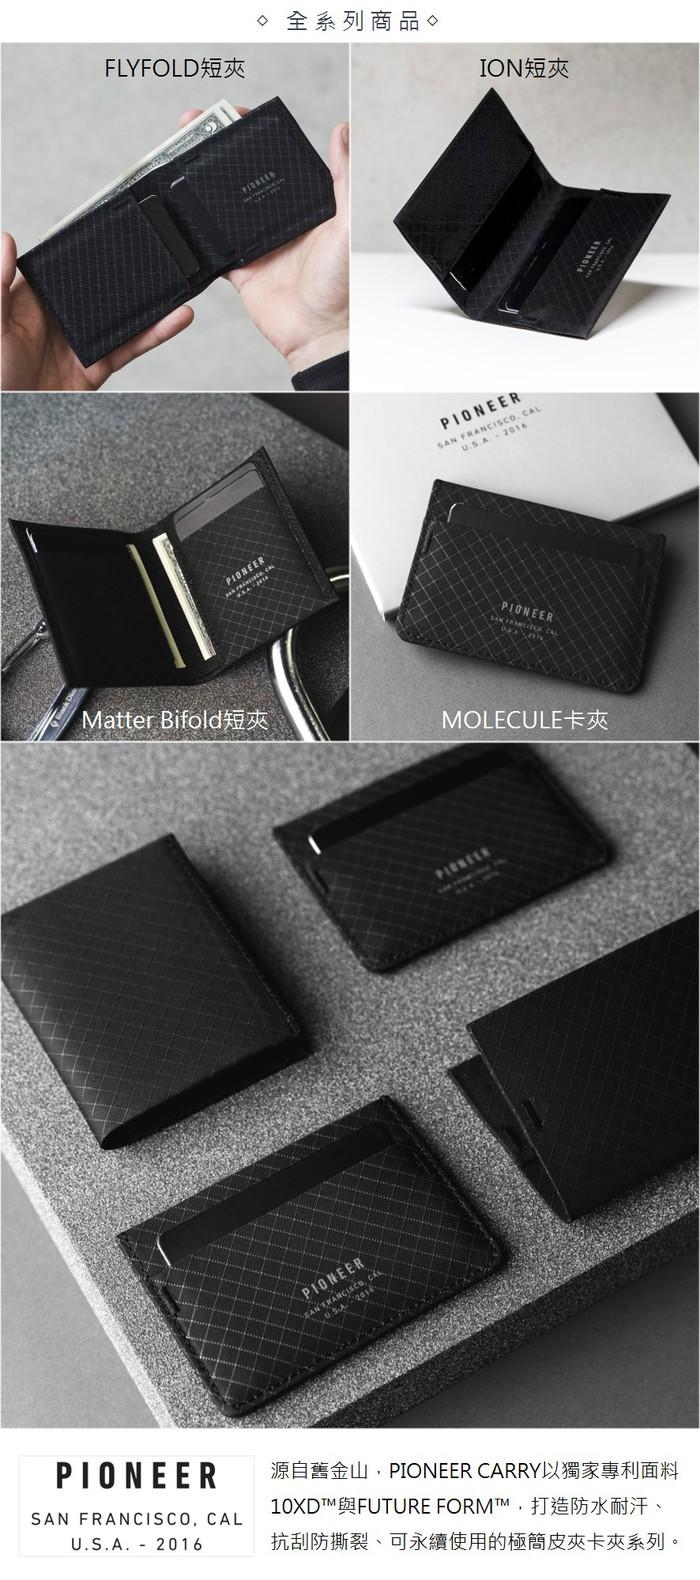 【集購】Pioneer Carry | Flyfold極簡防刮短夾 (獨家專利纖維)